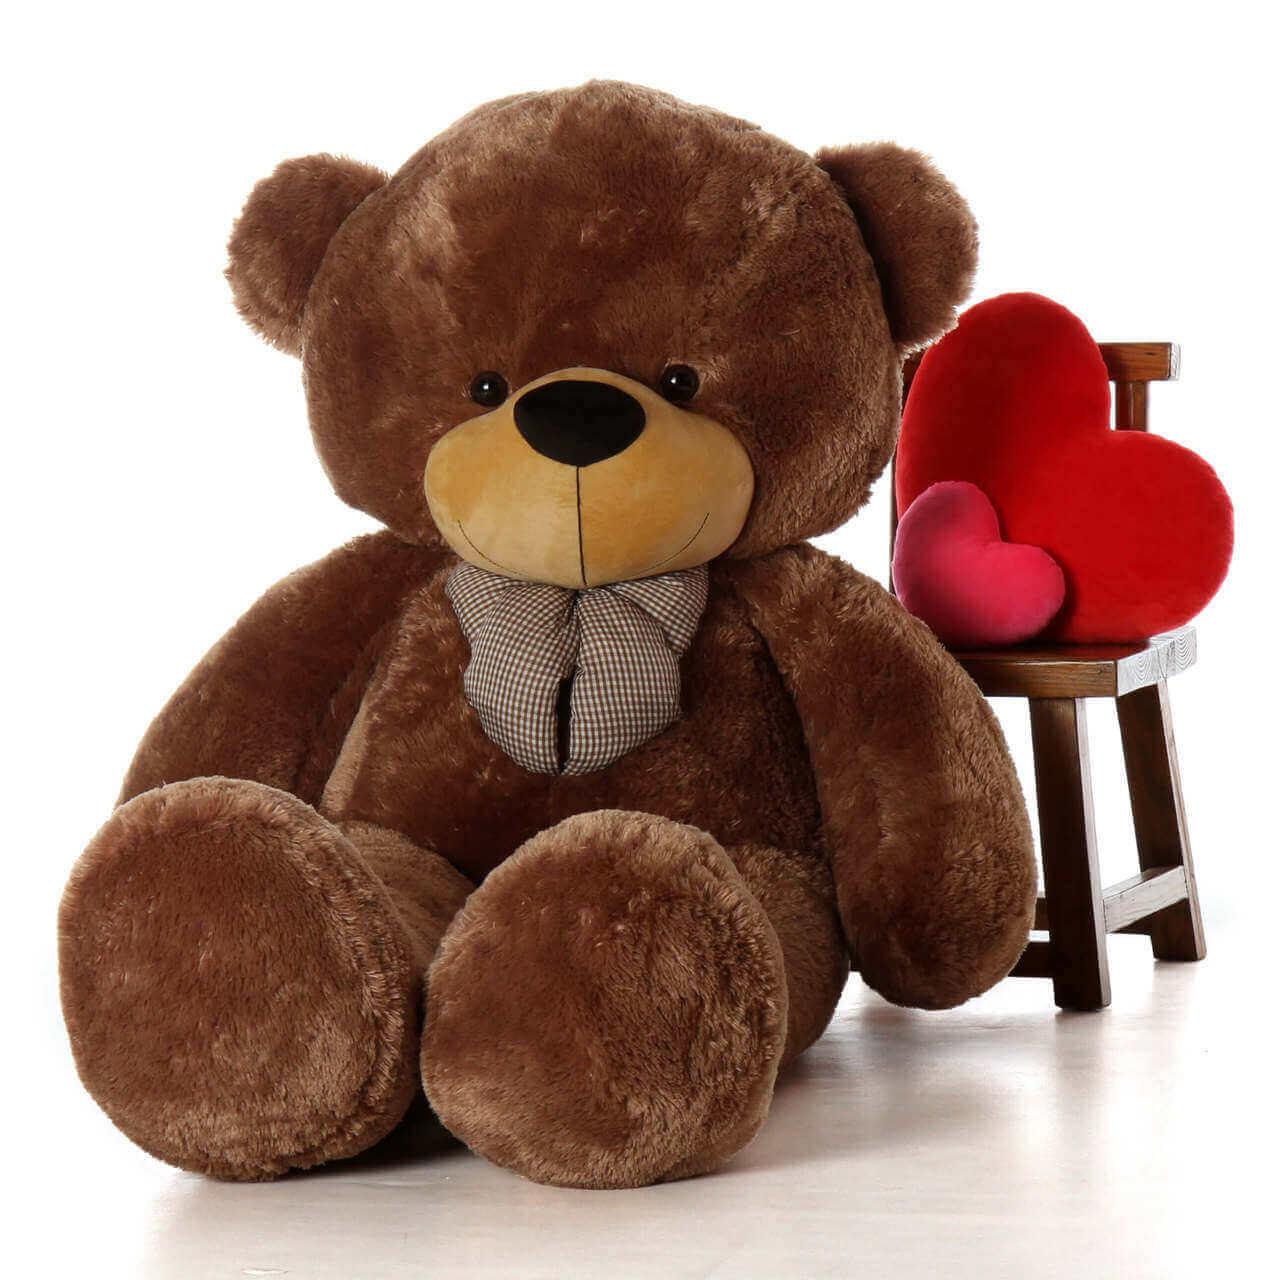 Life Size Mocha Brown Teddy Bear Sunny Cuddles 6ft